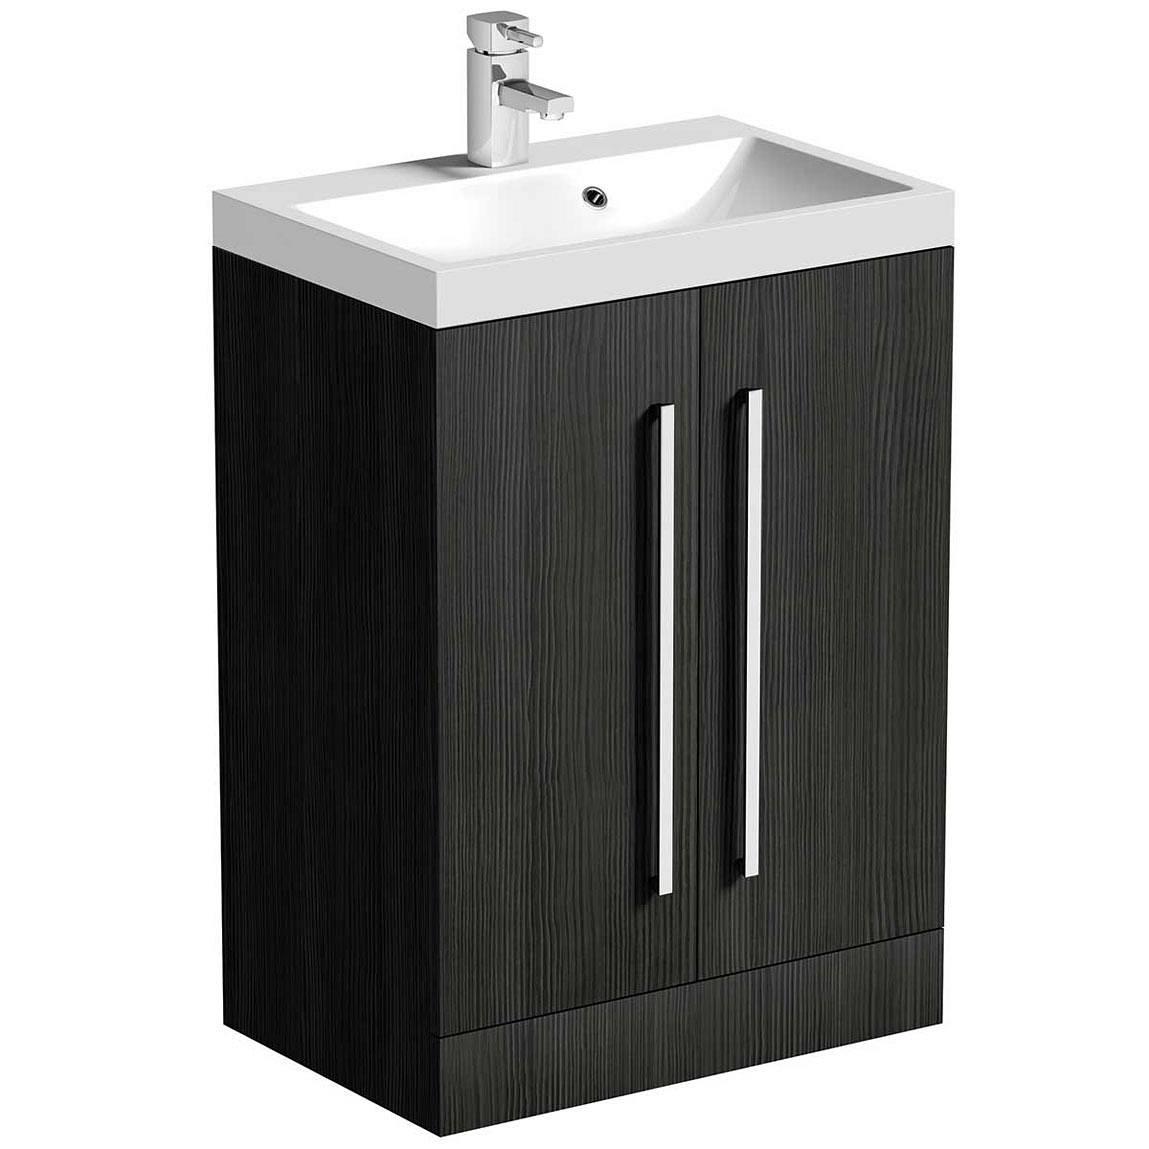 Drift essen vanity unit with basin 600mm for Bathroom cabinets victoria plumb